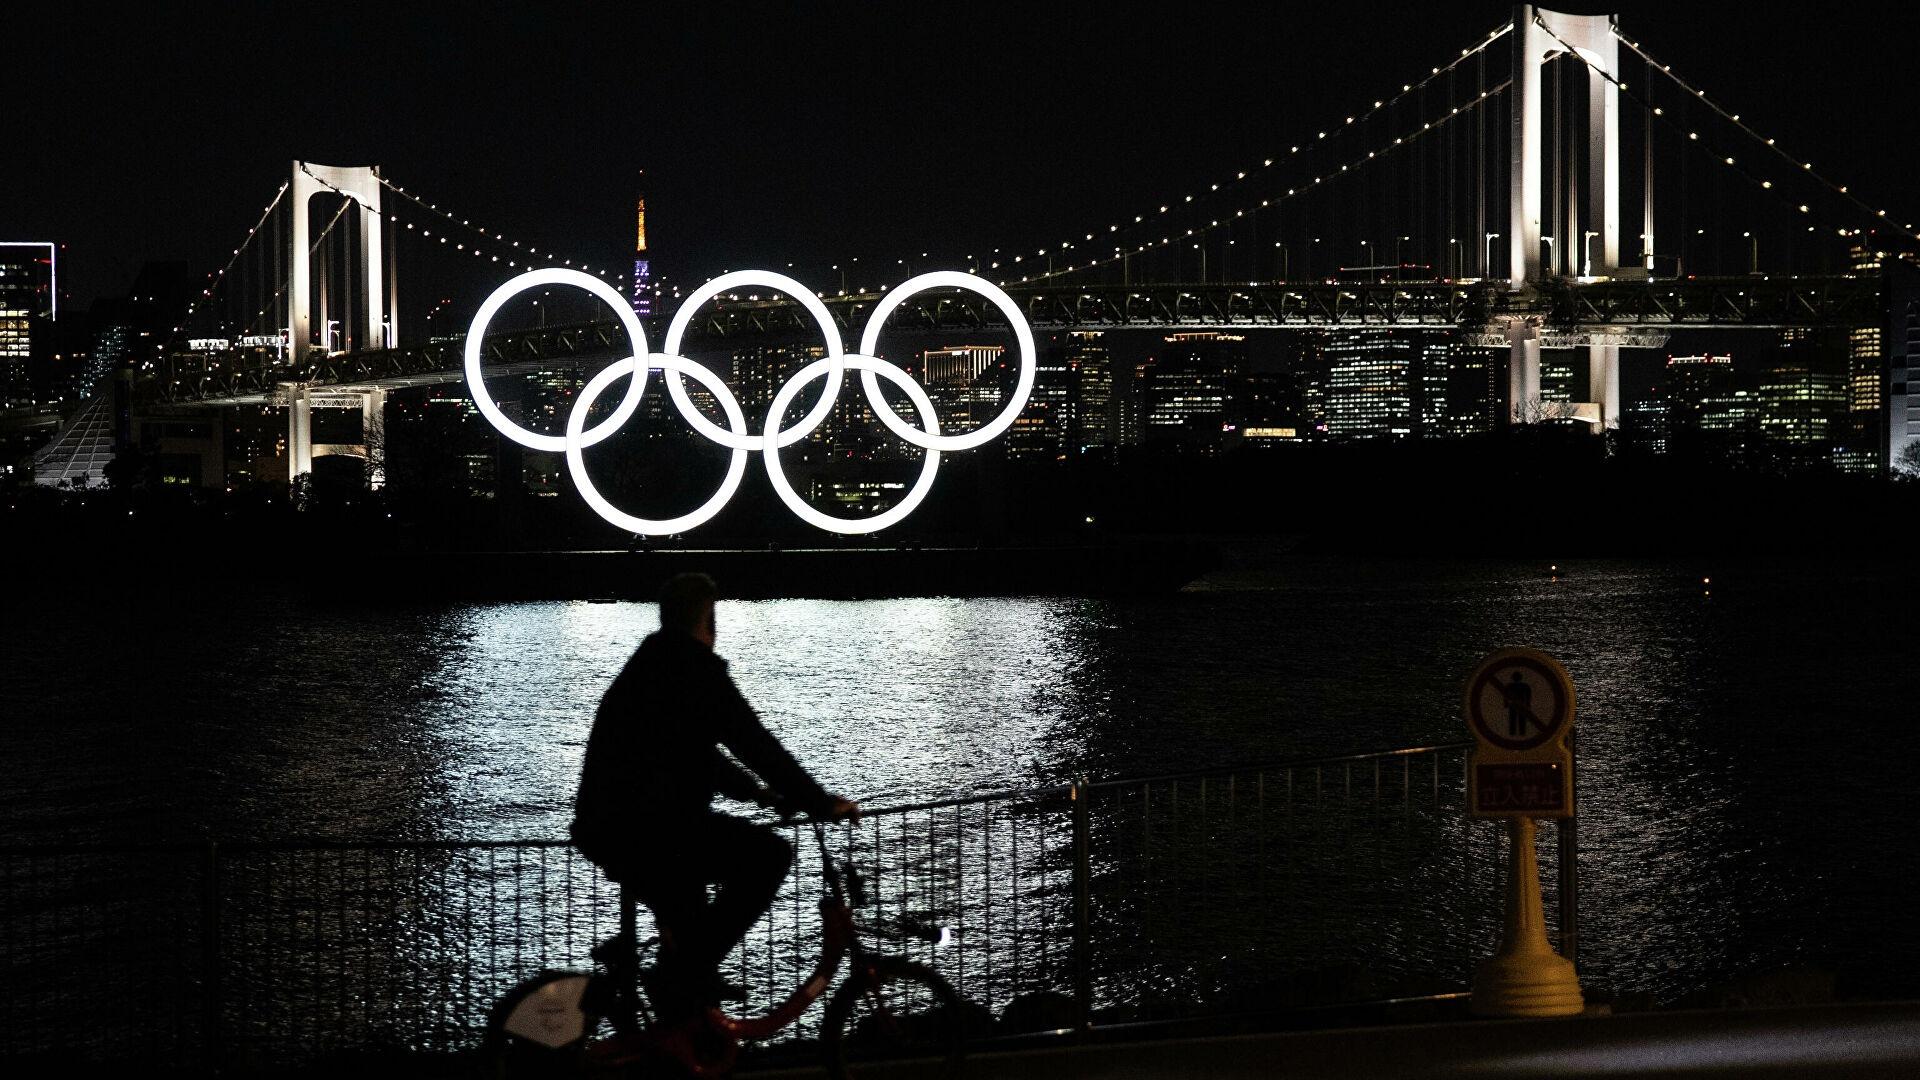 Tokyo 2020 Olympics windows wallpaper